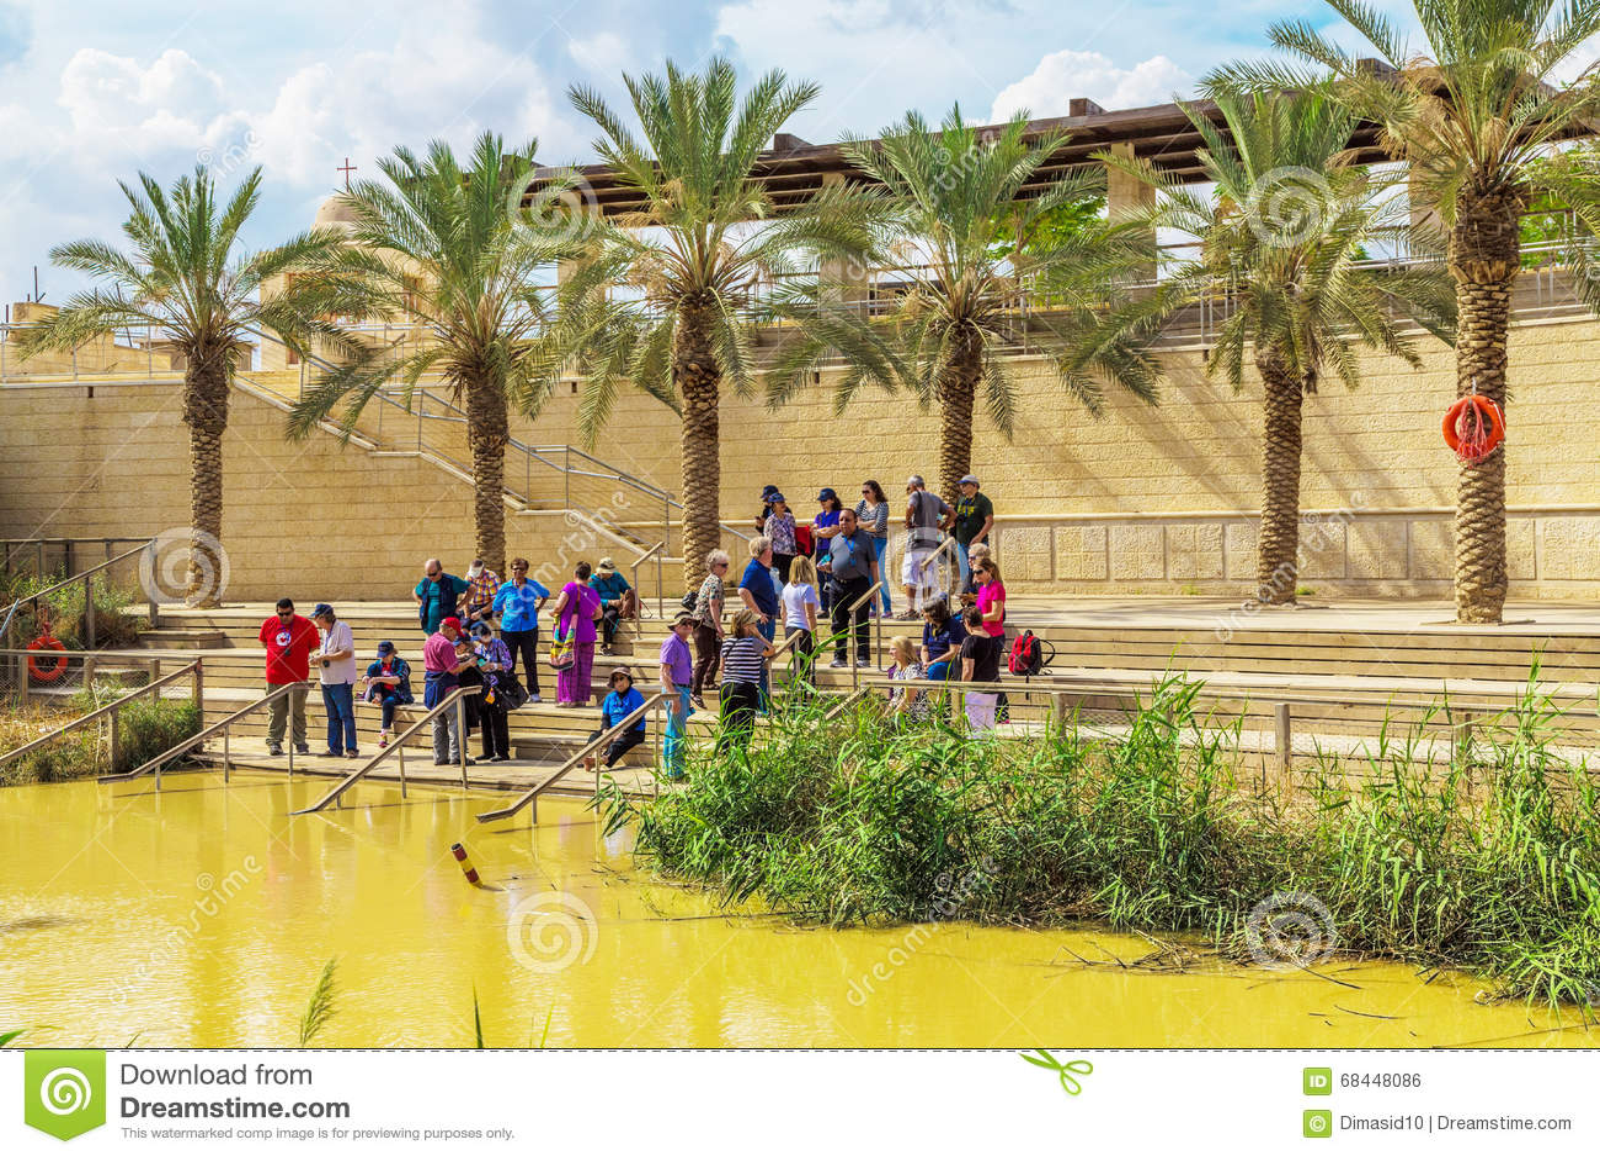 tourists near jordan river at the site of jesus u0027 baptism